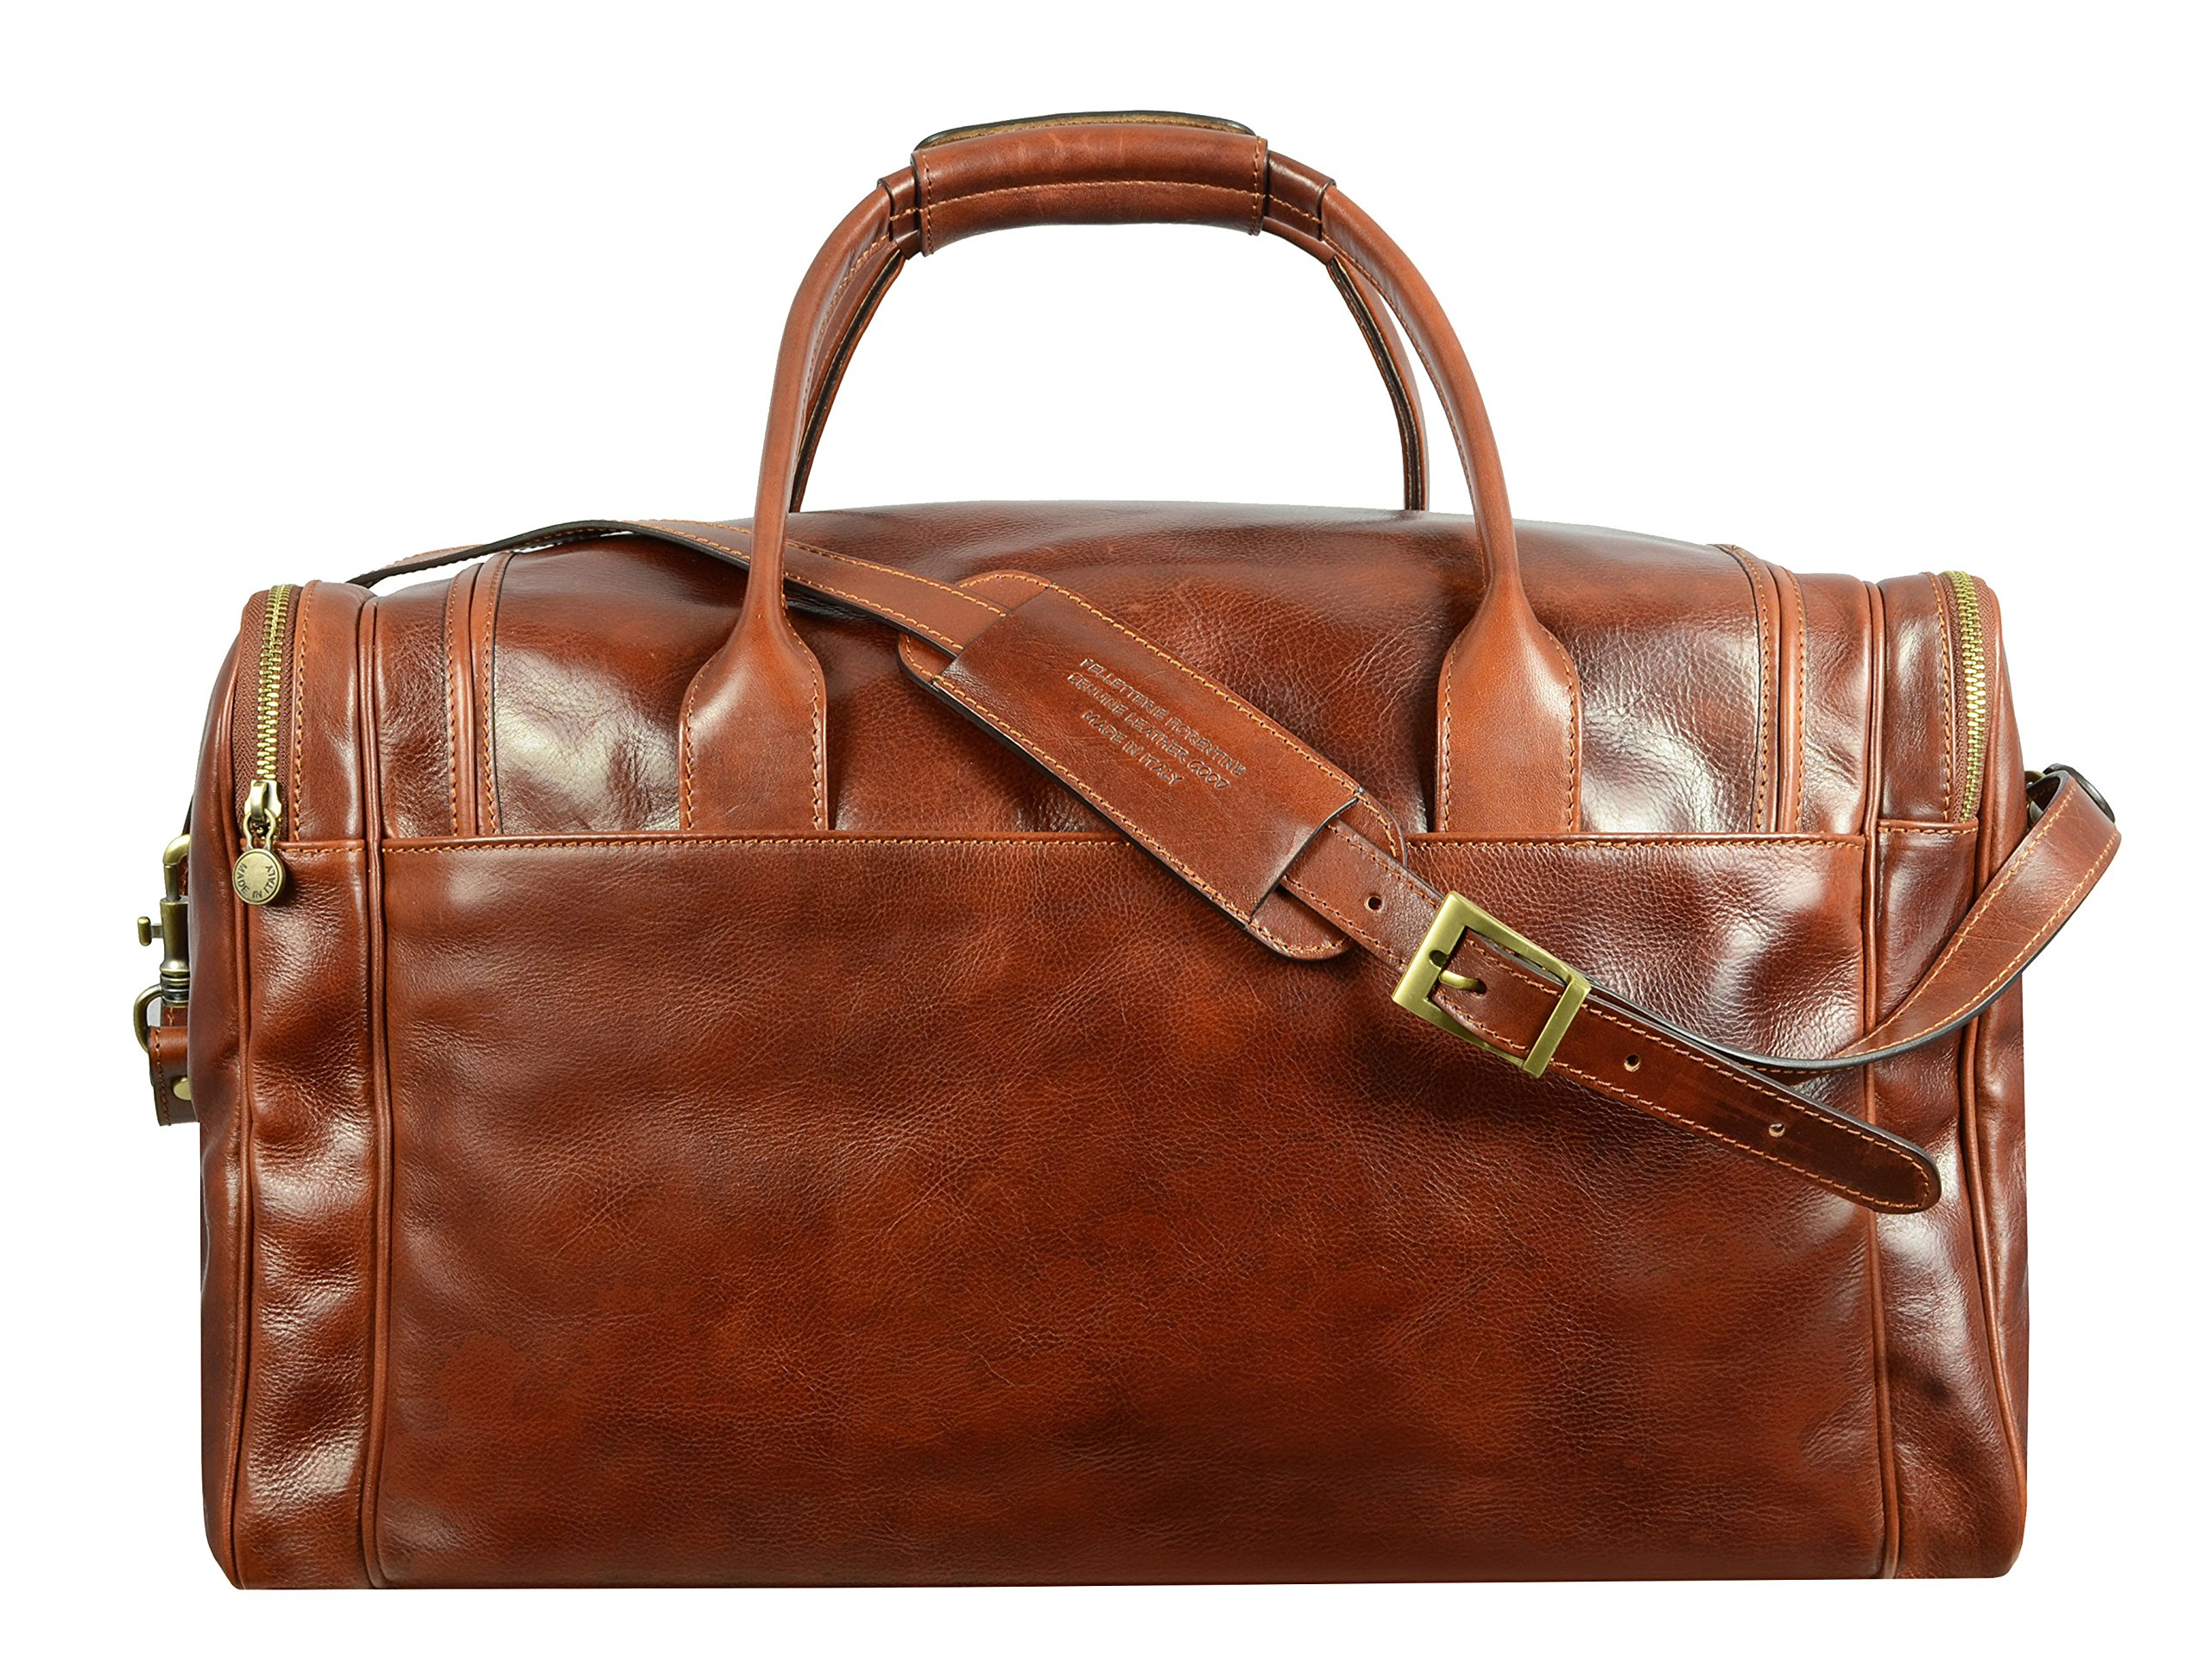 Leather Duffel Bag, Weekend Bag, Gym, Large Travel Bag, Cognac, Brown - Time Resistance by Time Resistance (Image #2)